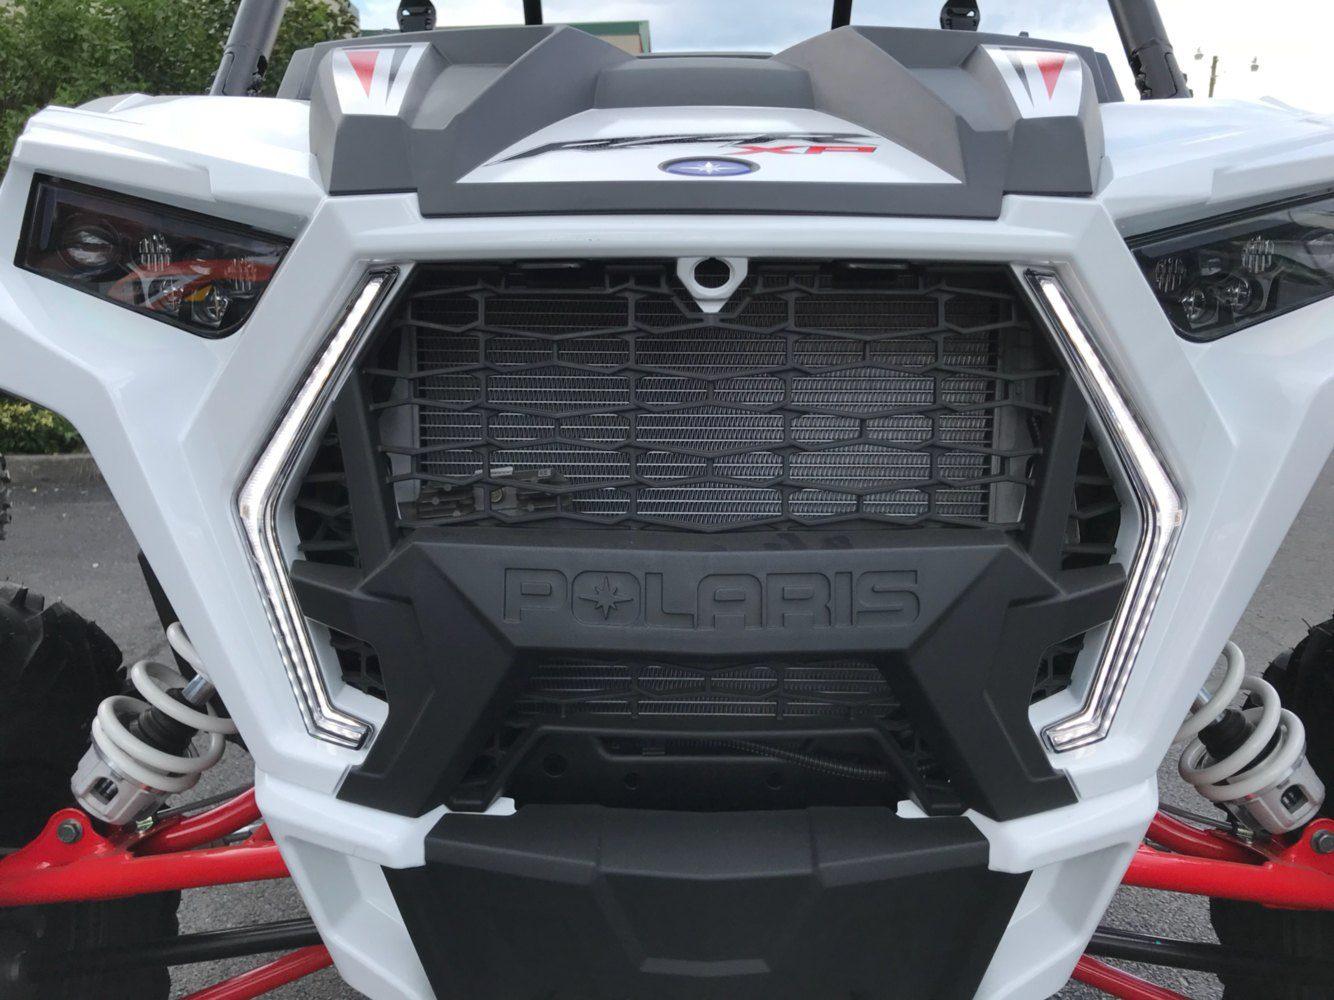 2019 Polaris RZR XP 1000 Dynamix in Petersburg, West Virginia